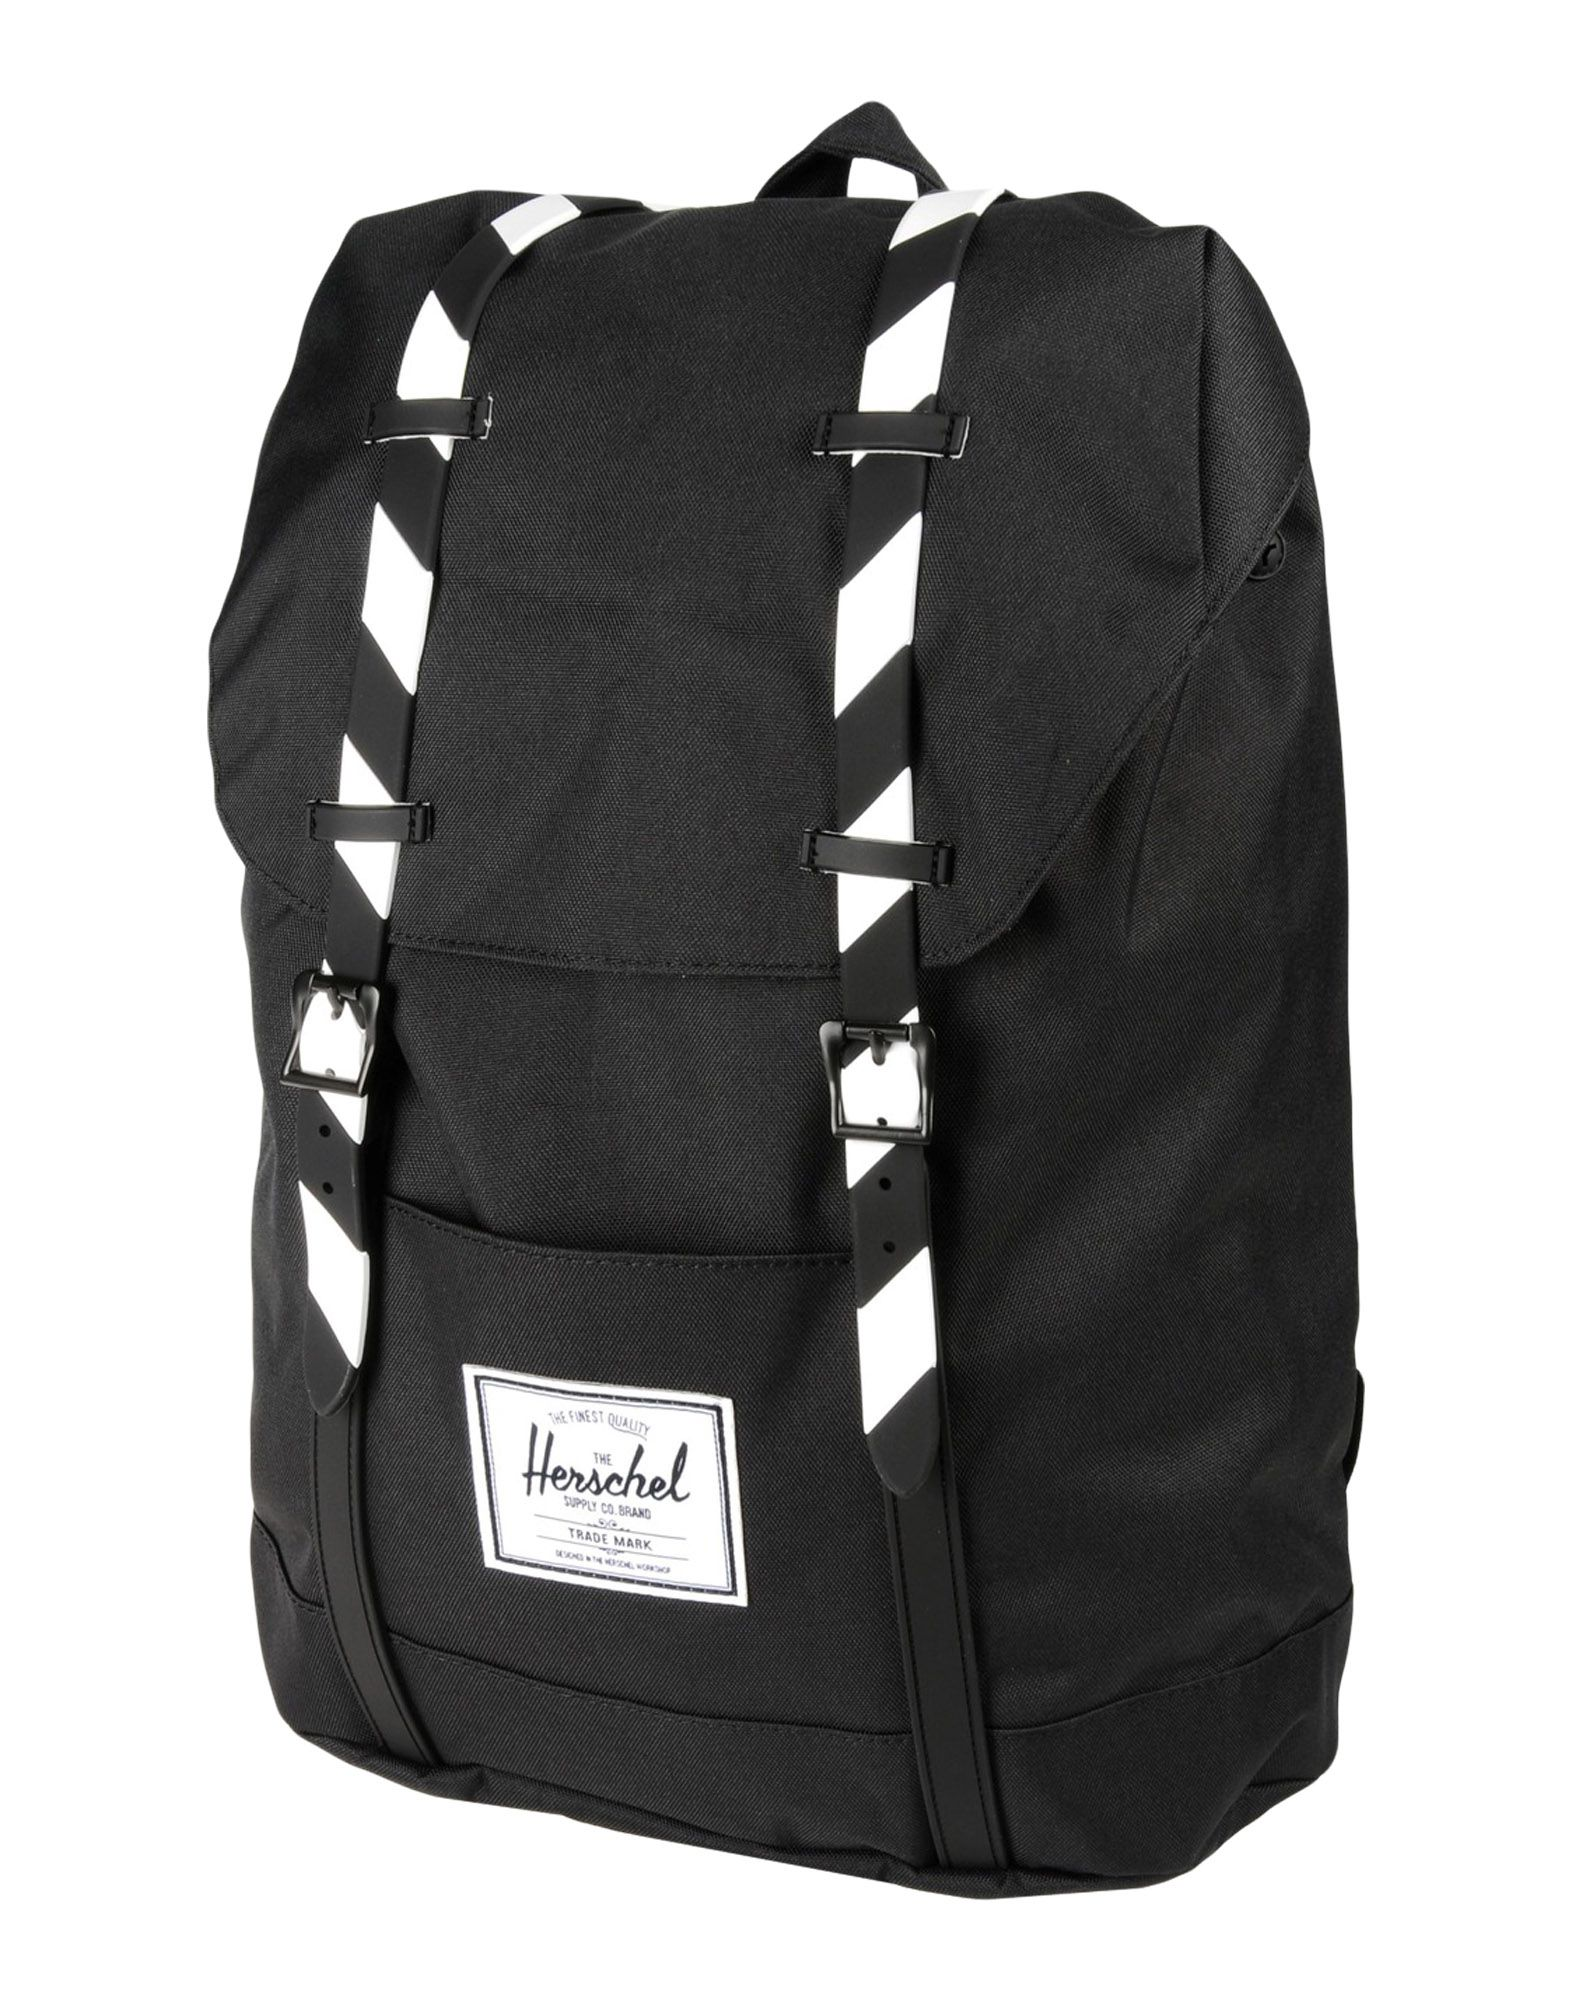 The Herschel Supply Co. Brand Backpacks & Fanny Packs